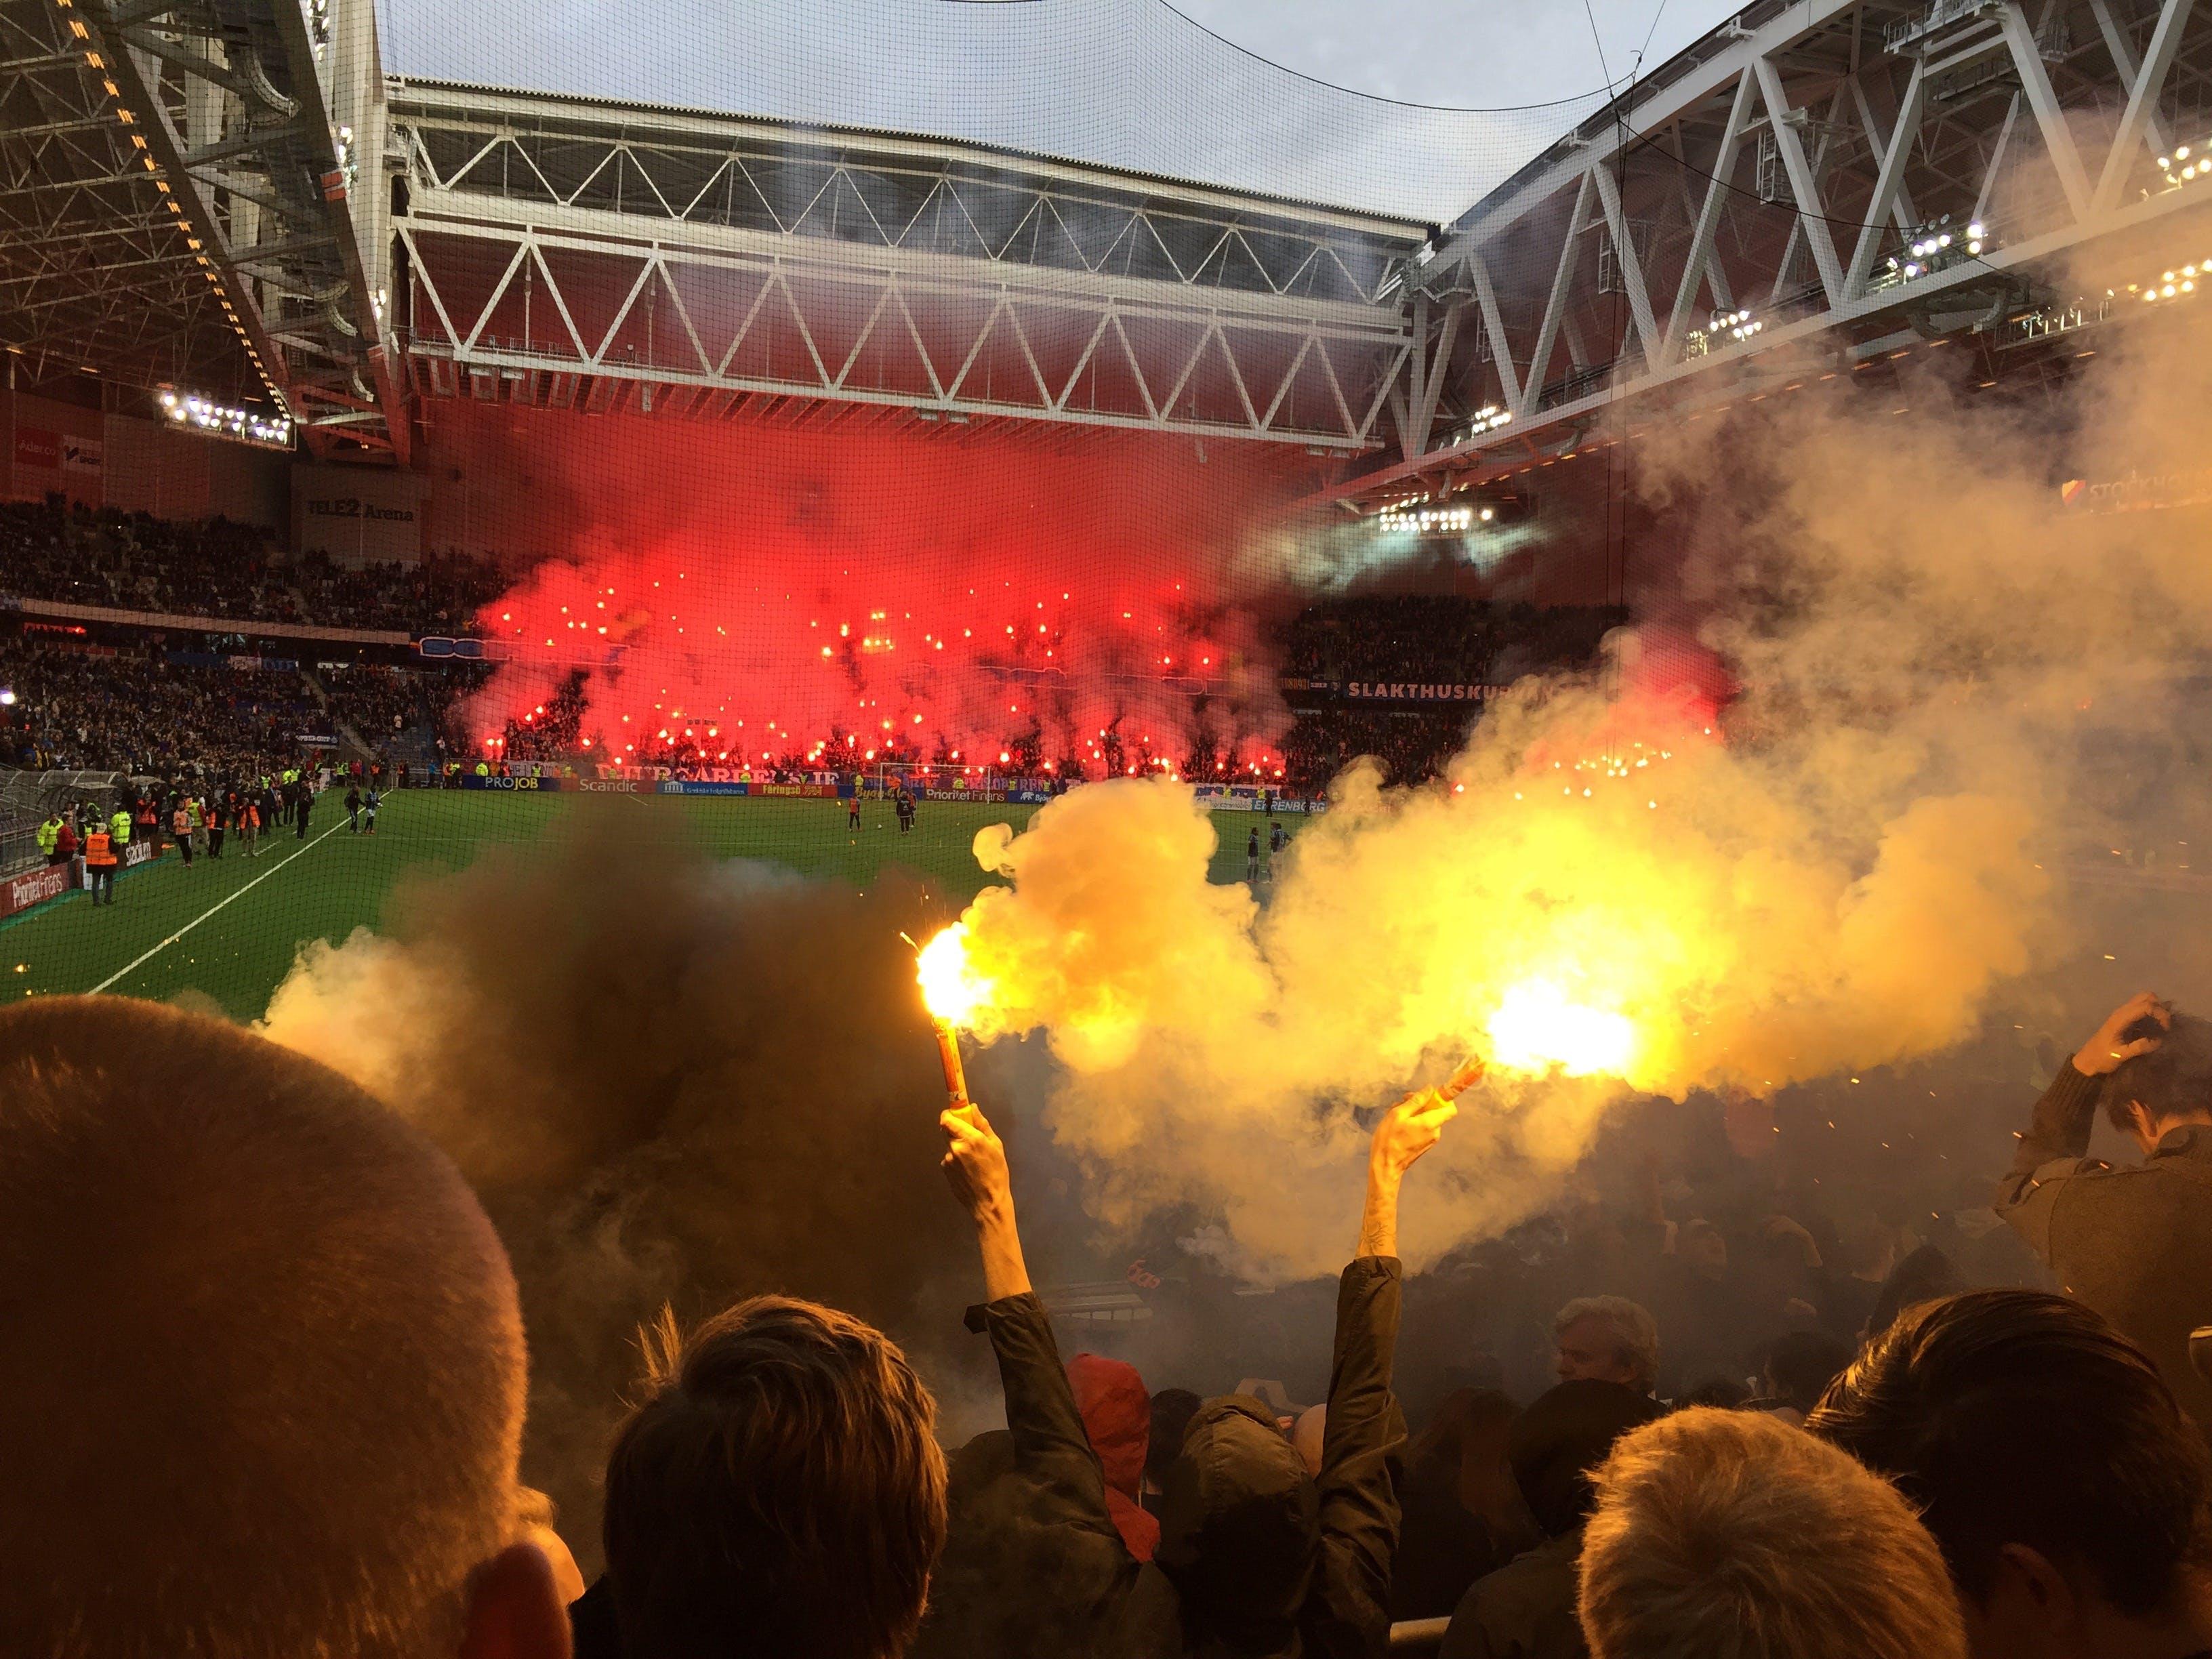 Free stock photo of football, game, pyrotechnic, pyrotechnics